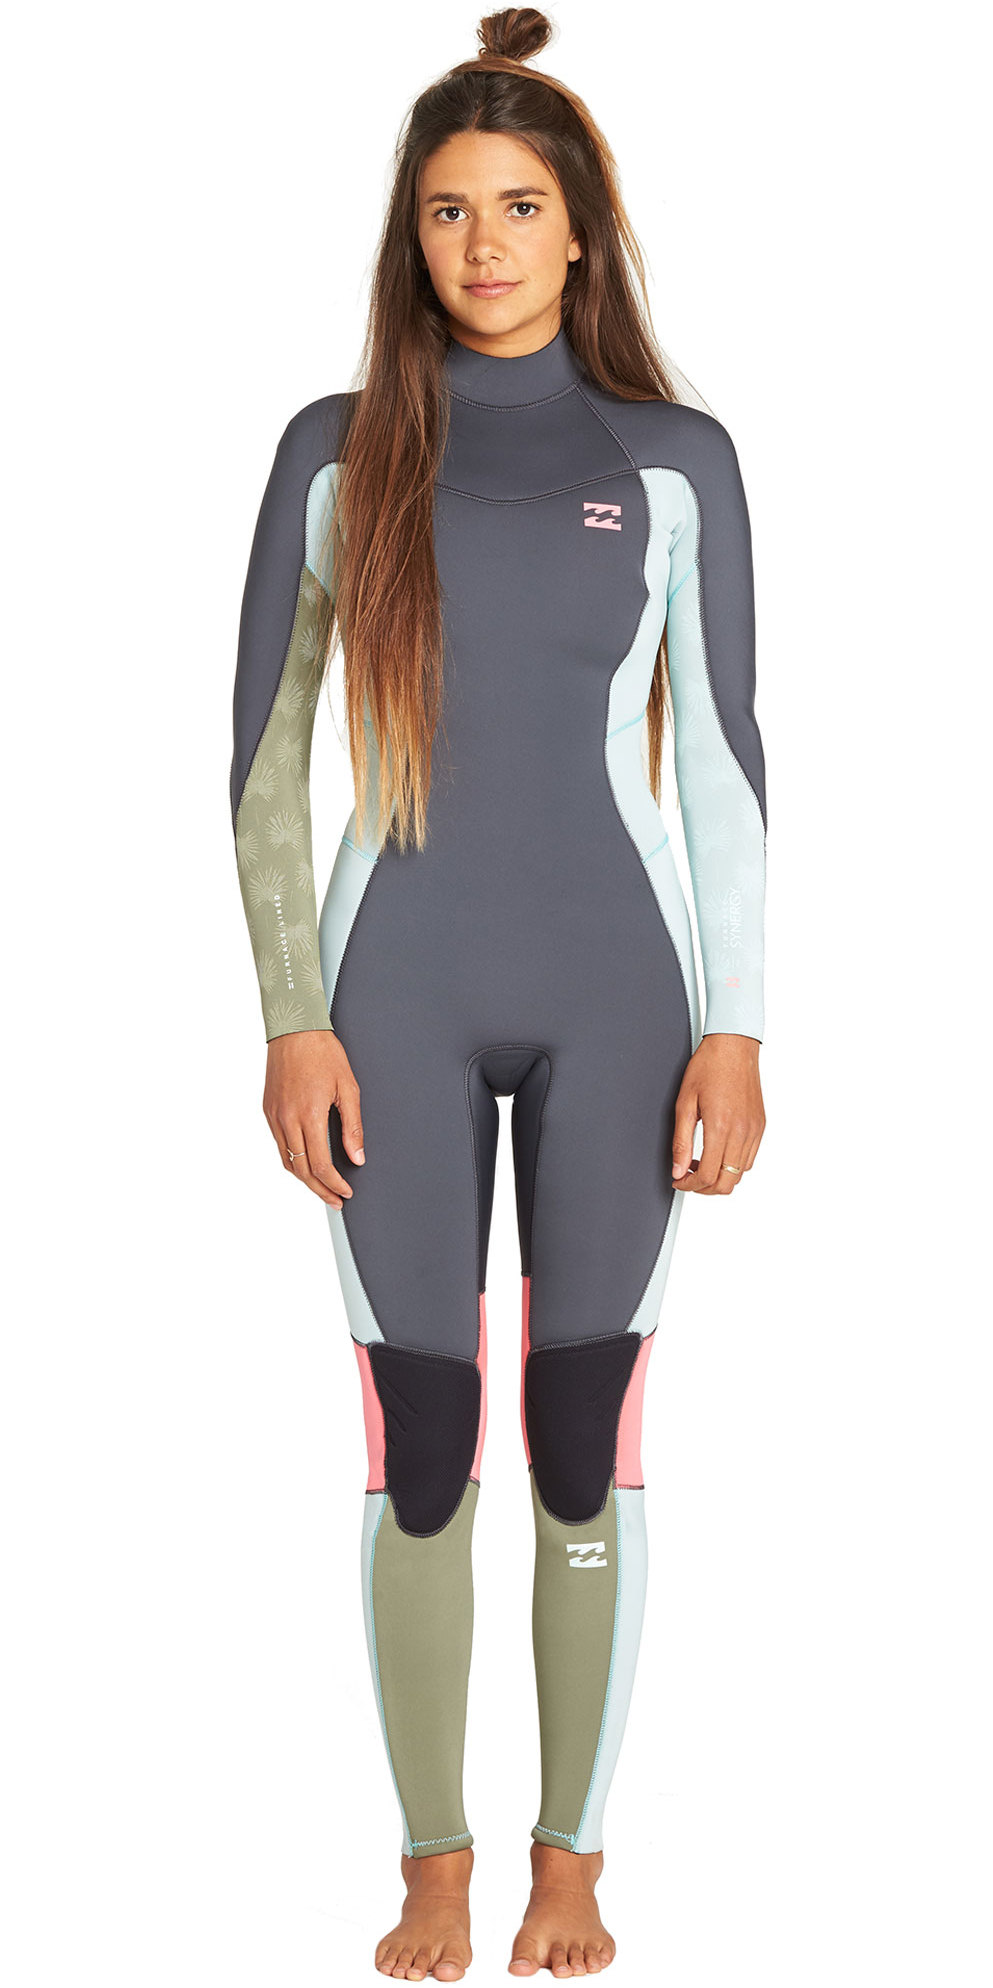 2019 Billabong Junior Girls Furnace Synergy 3/2mm Back Zip Flatlock Wetsuit Seafoam N43B08